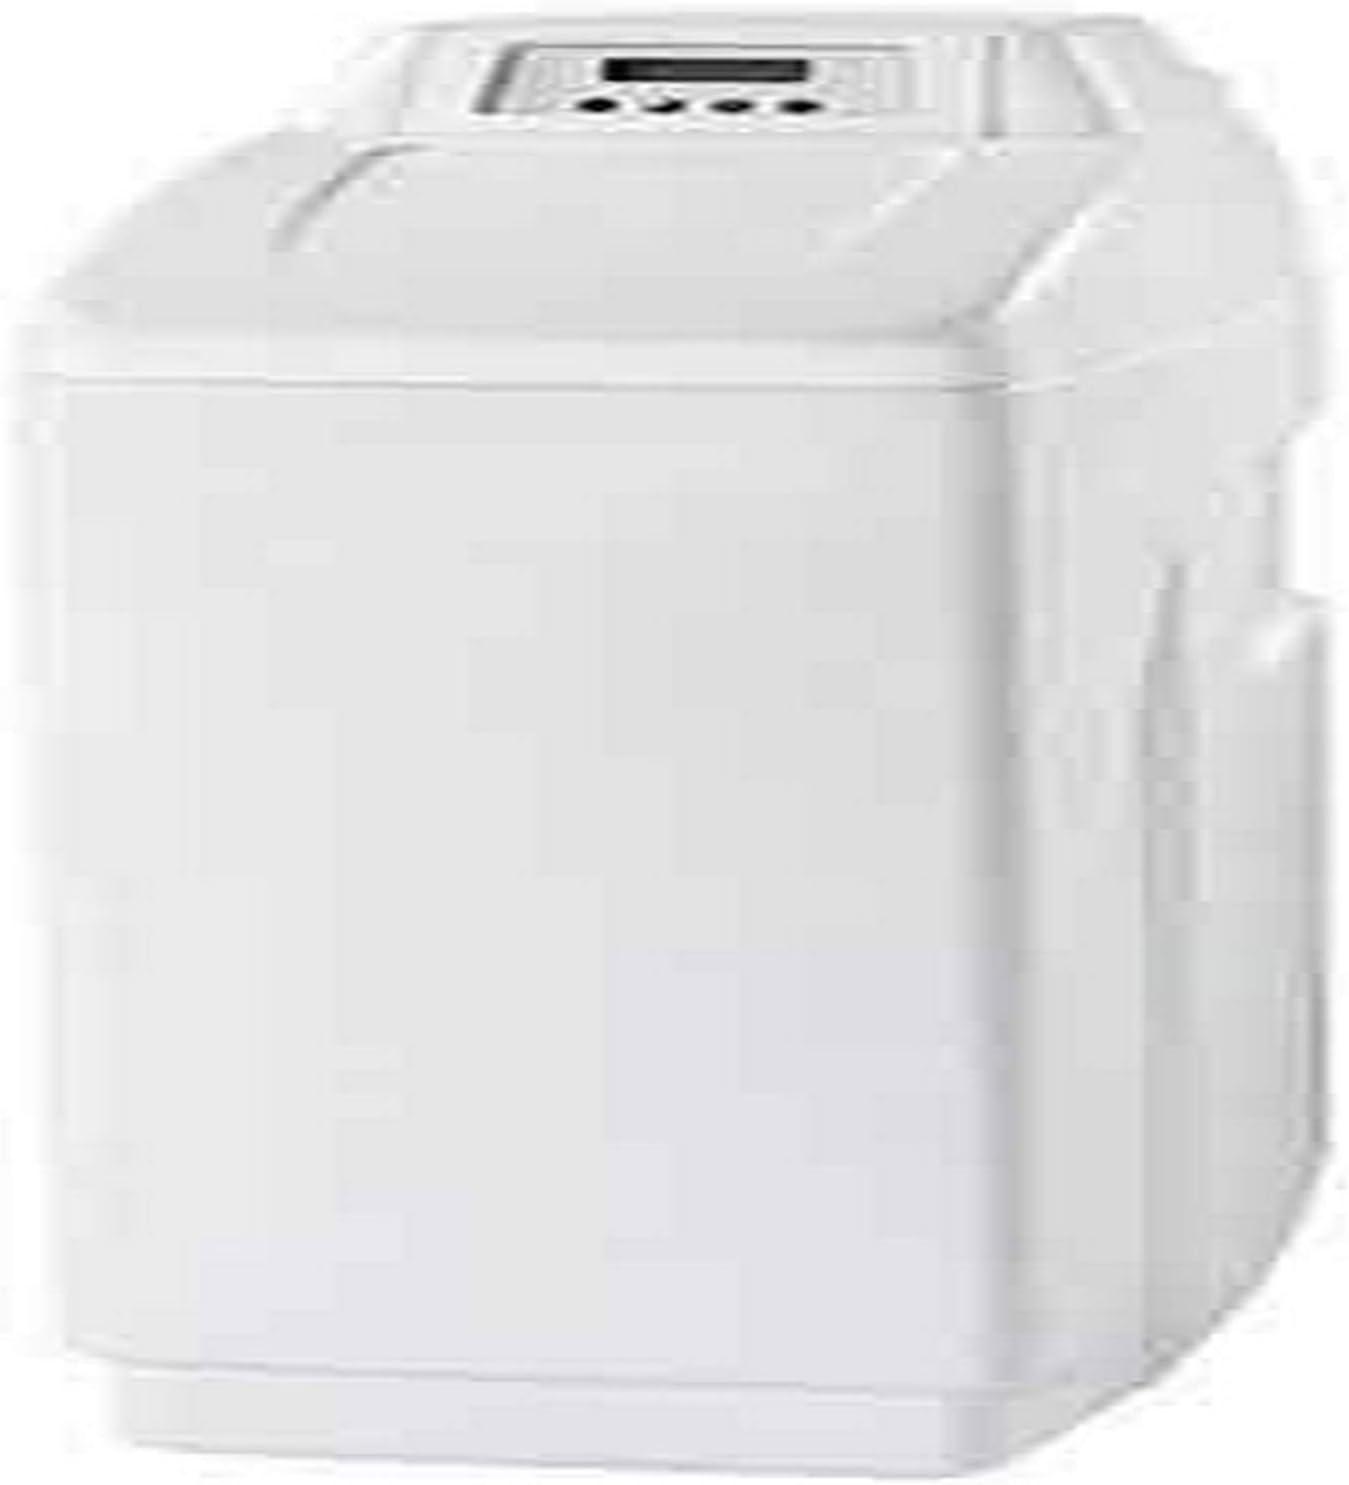 OMNIFilter OM26KCS-S-S06 Cabinet Water Softener